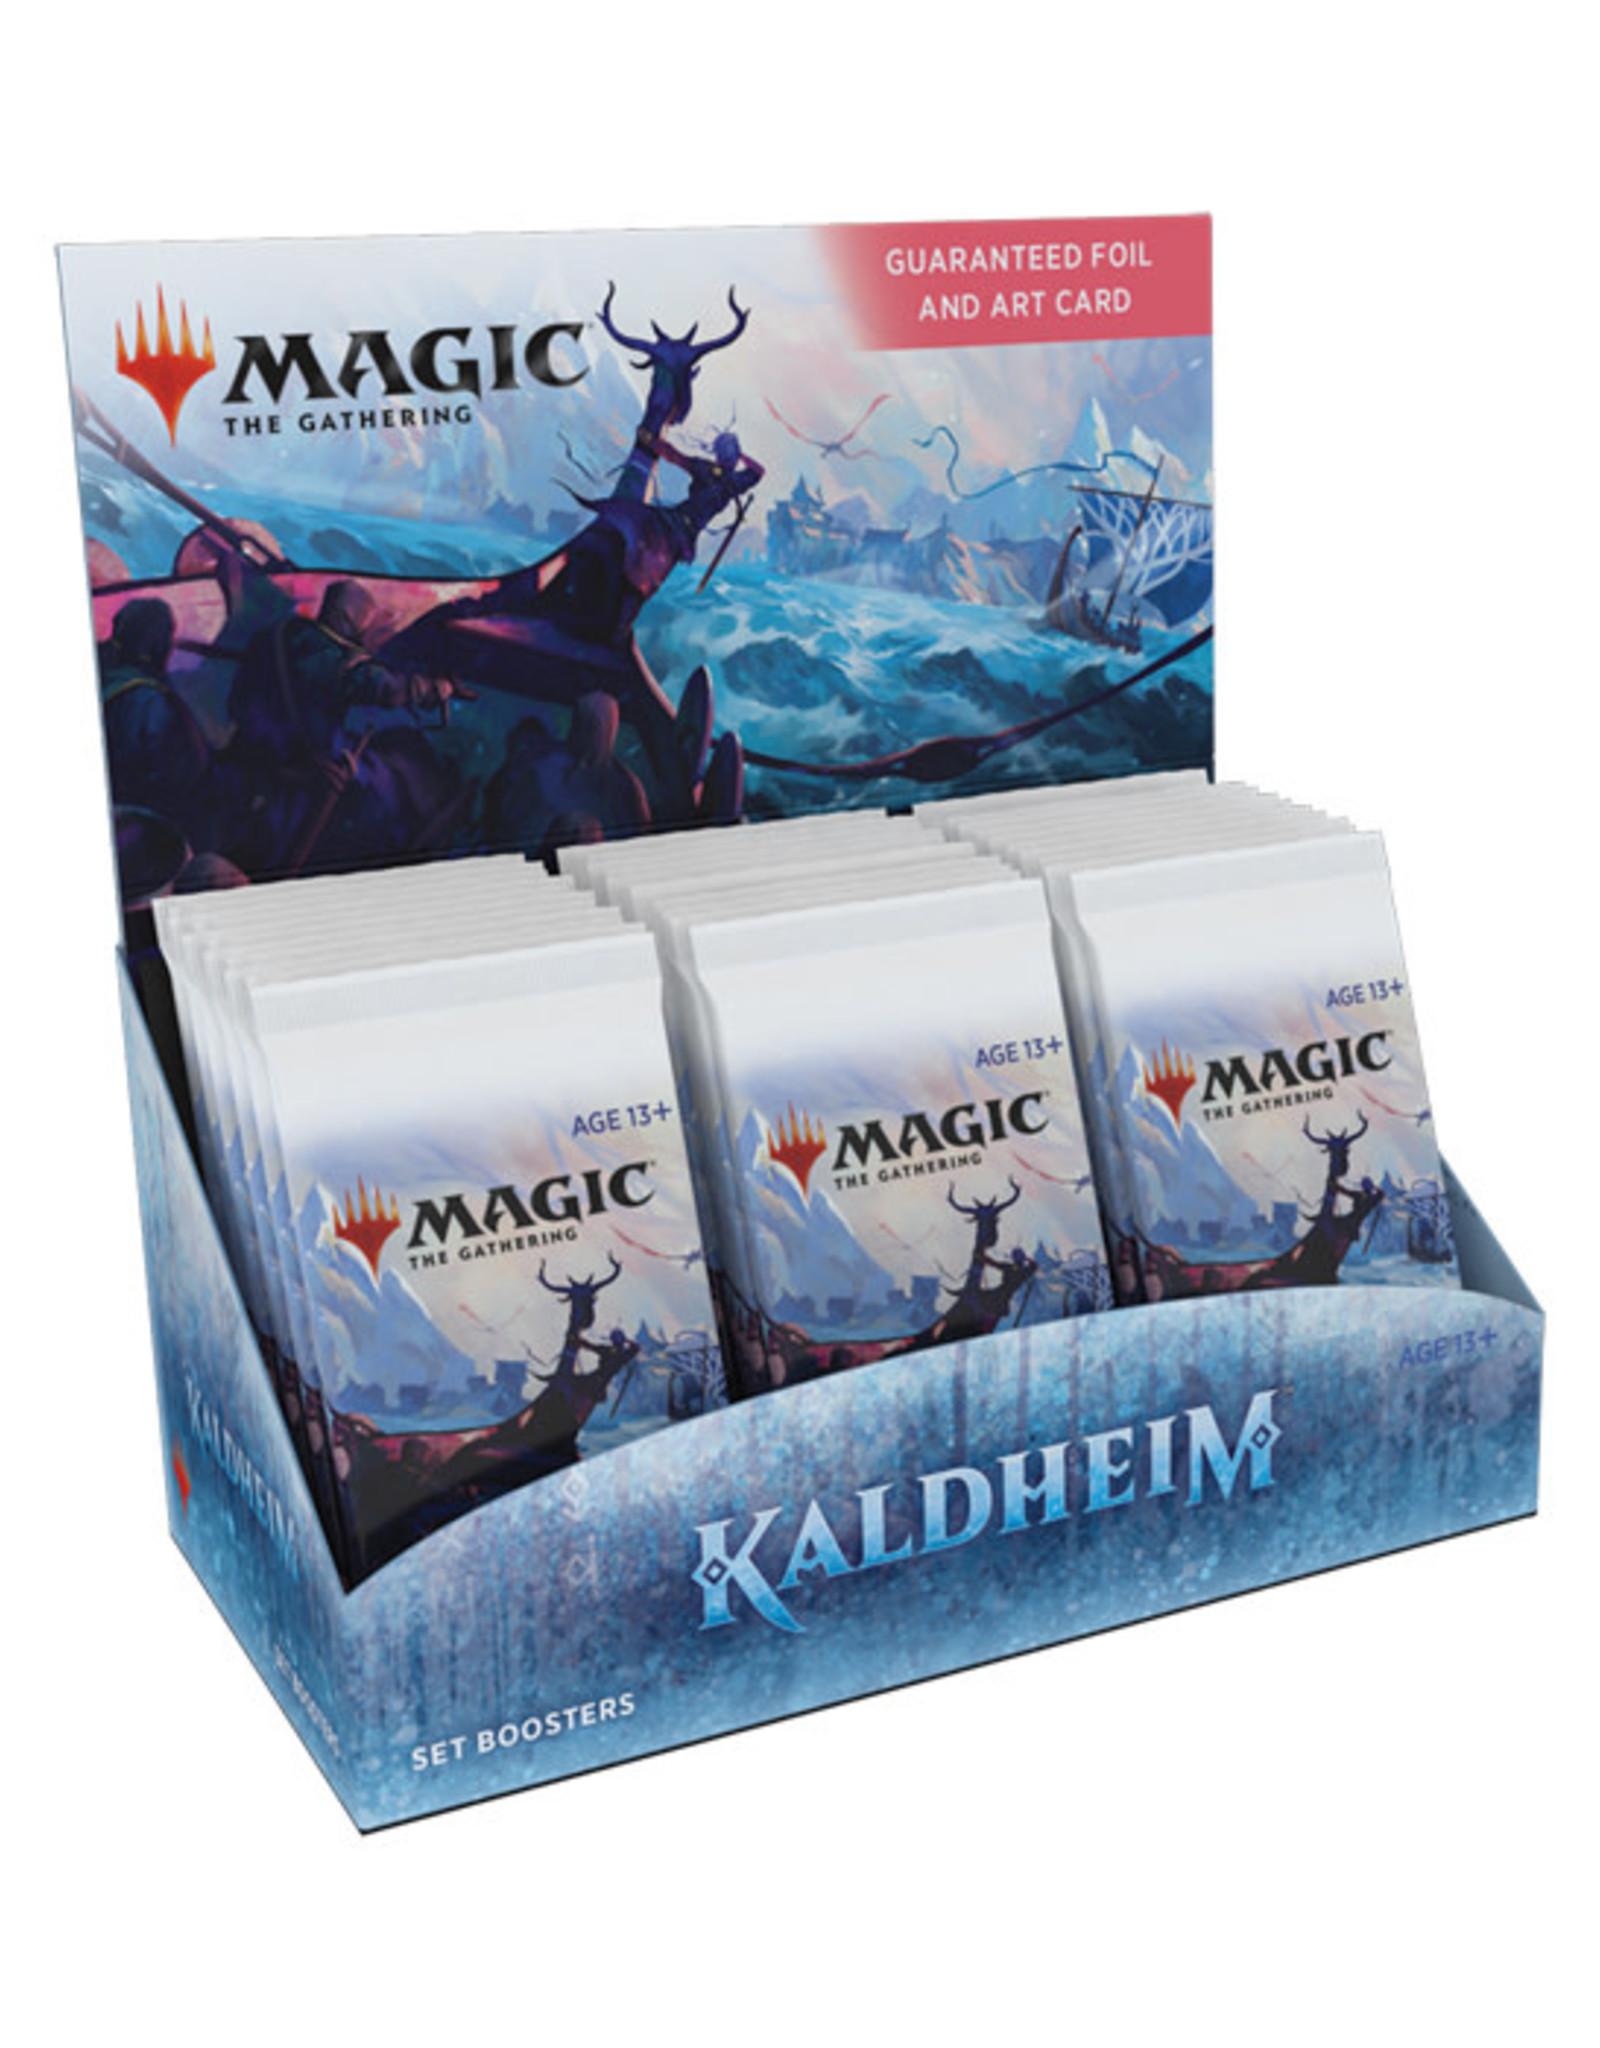 Magic: The Gathering Magic: The Gathering - Kaldheim - Set Booster Box